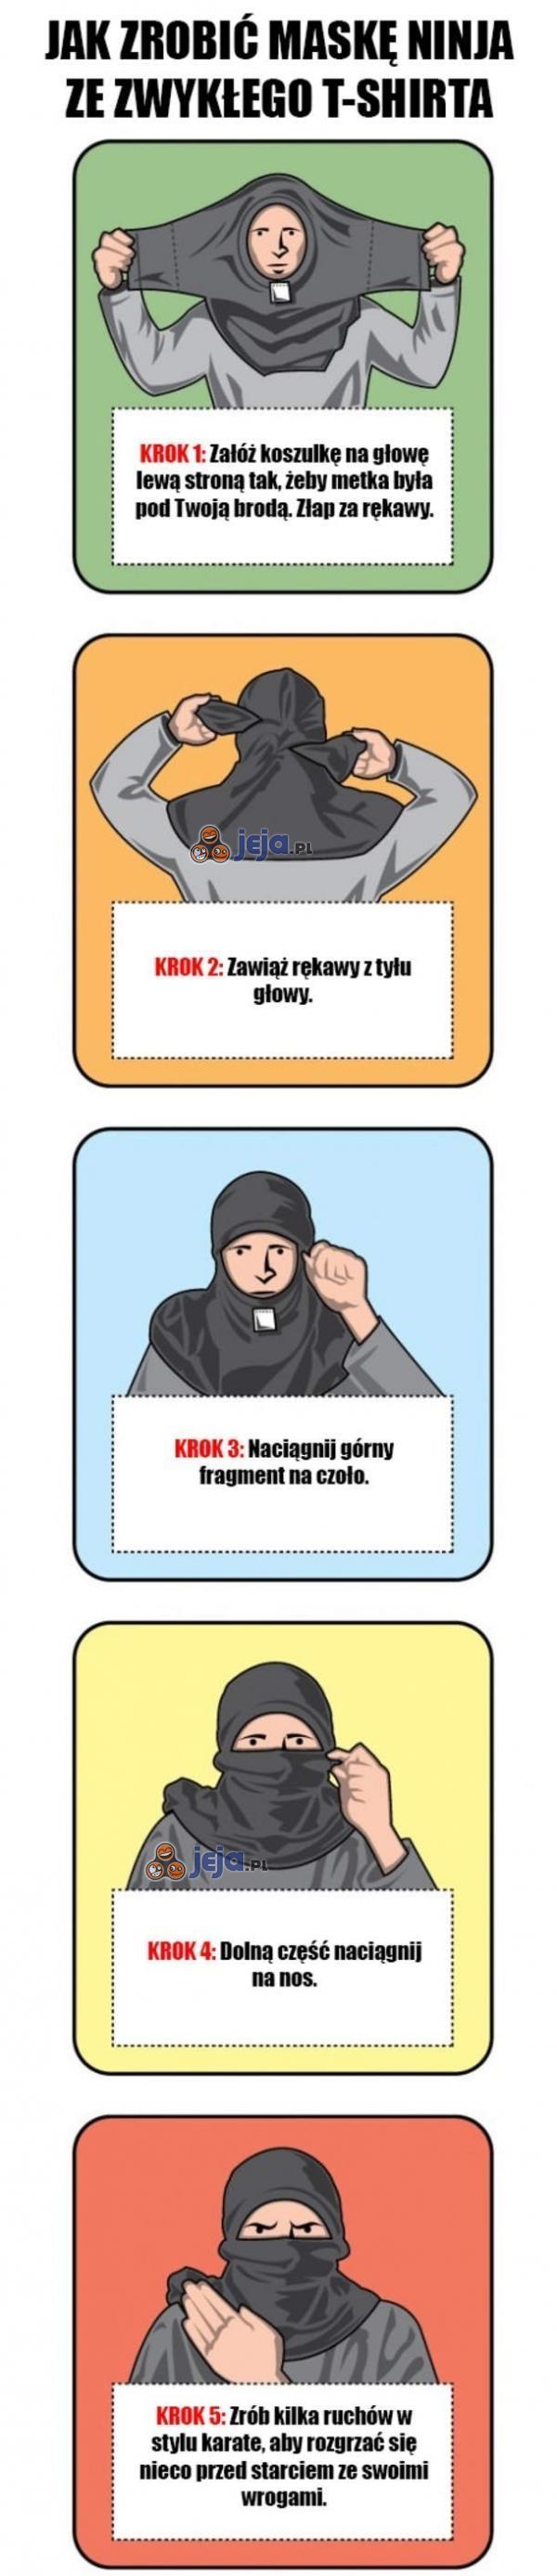 Sposób na maskę ninja!